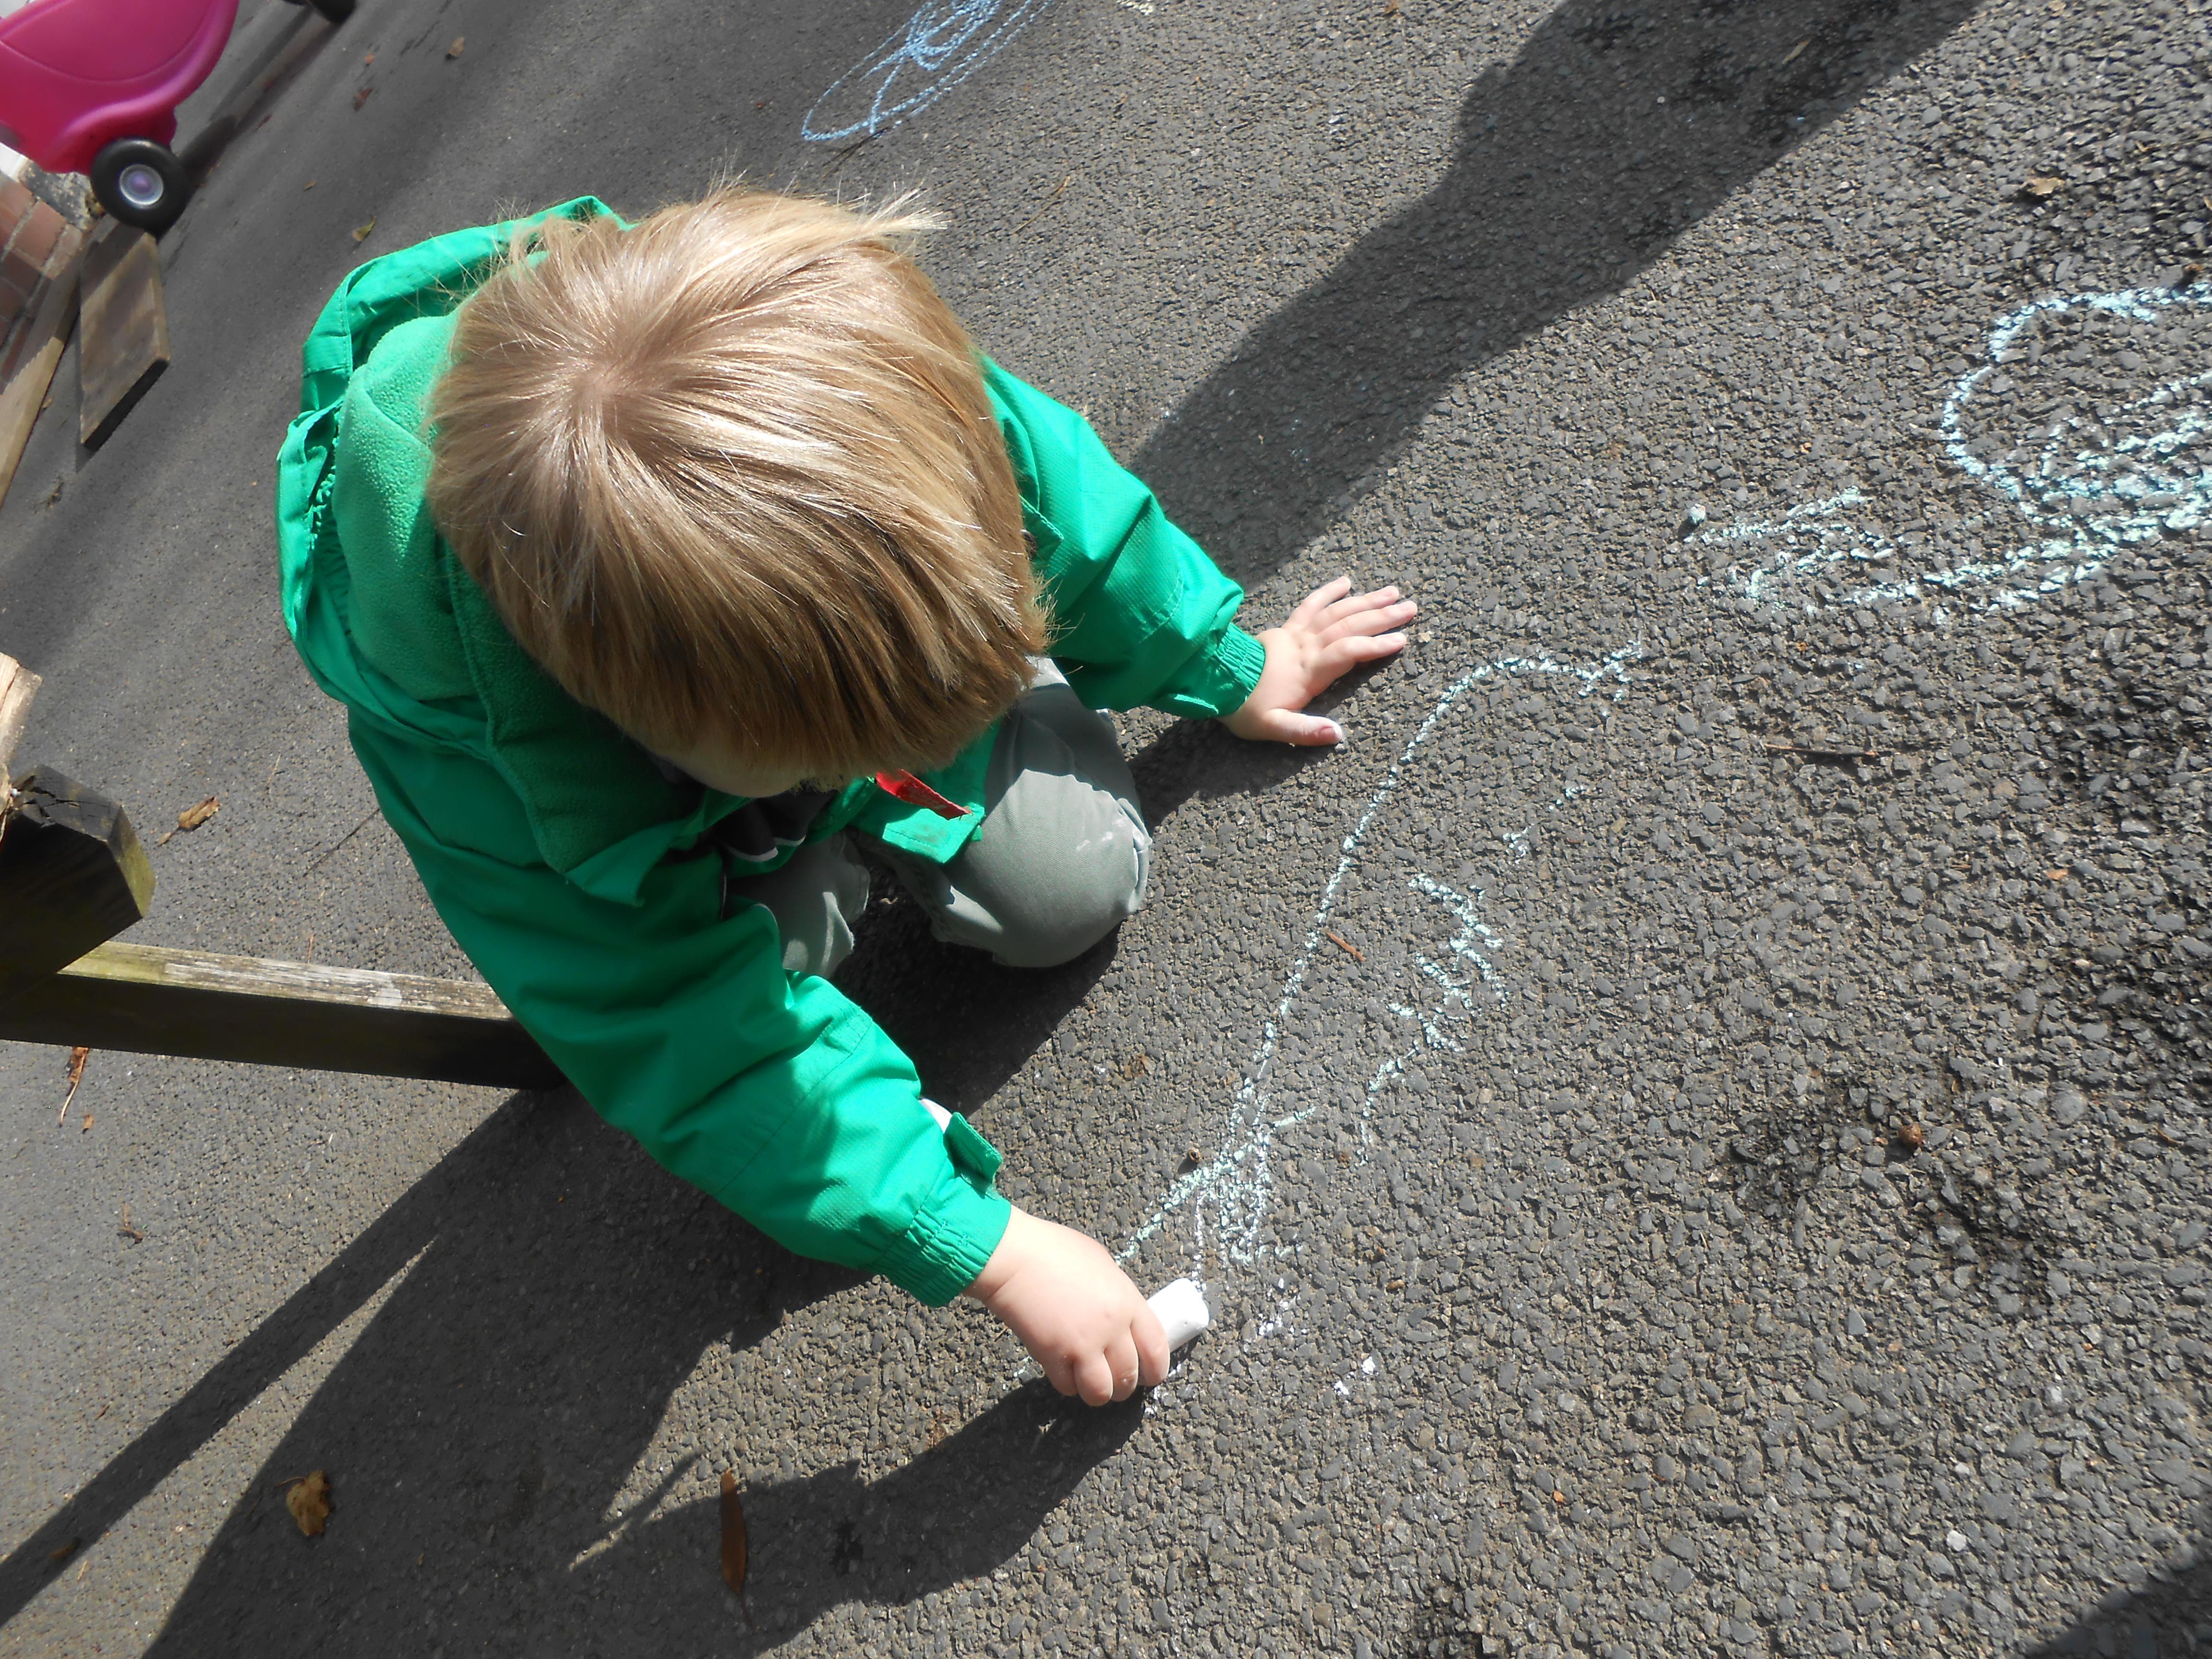 Chalks on the playground